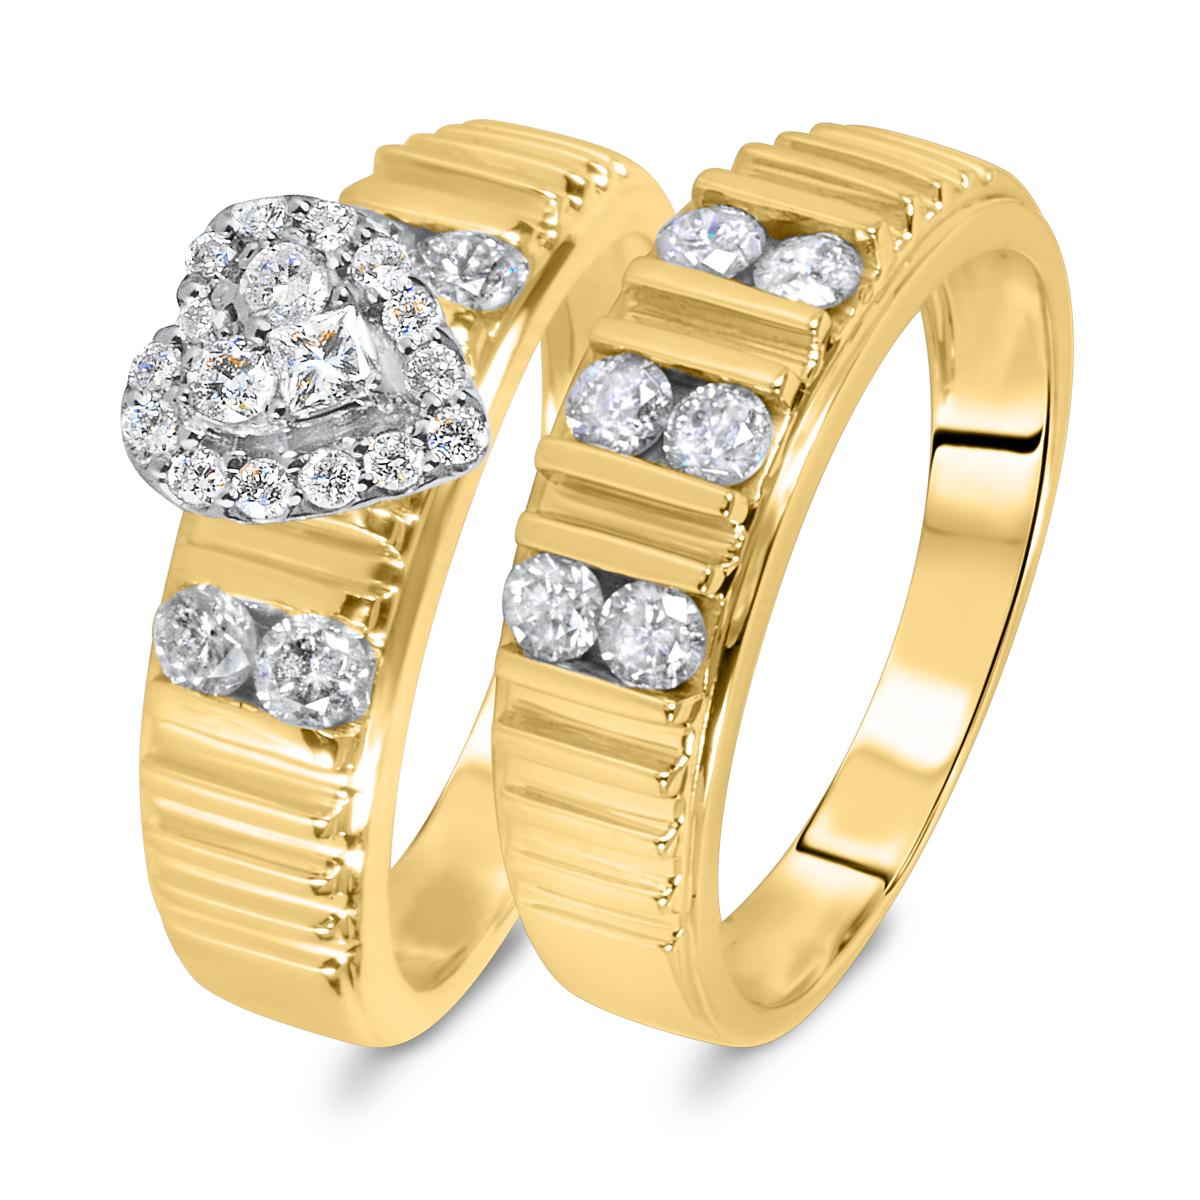 7/8 CT. T.W. Diamond Women's Bridal Wedding Ring Set 10K Yellow Gold